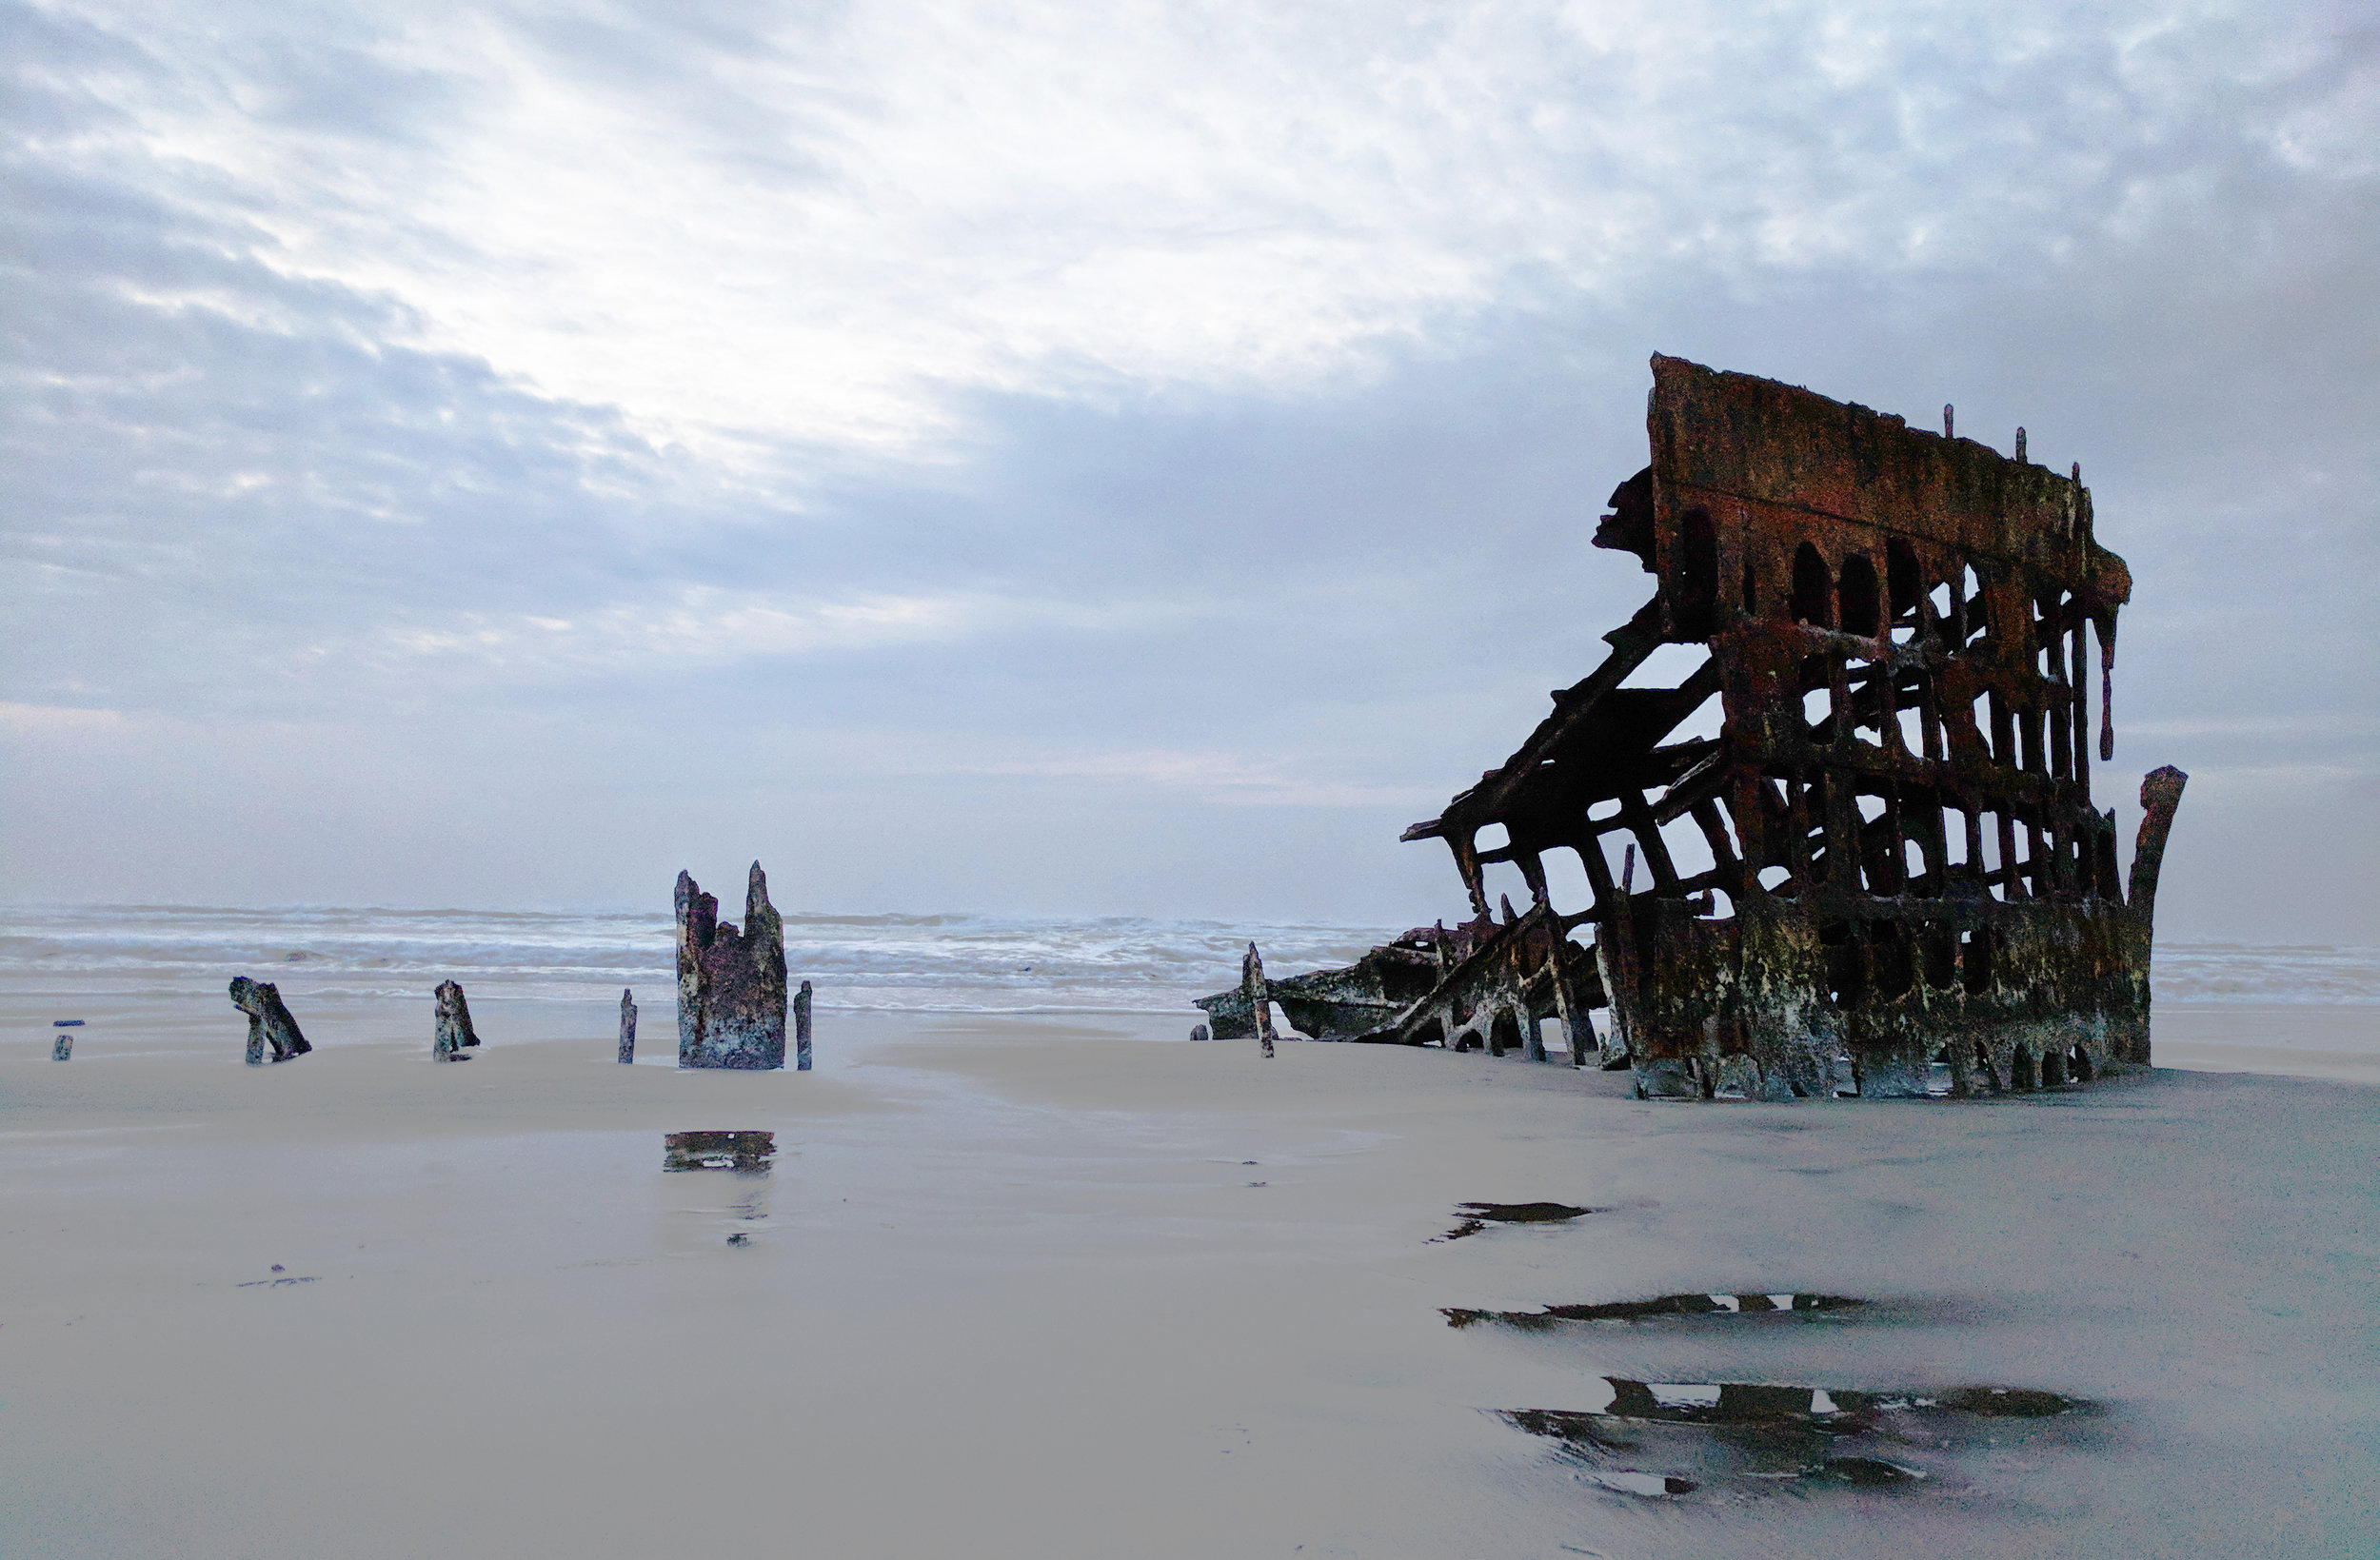 Peter-Iredale-Shipwreck.jpg